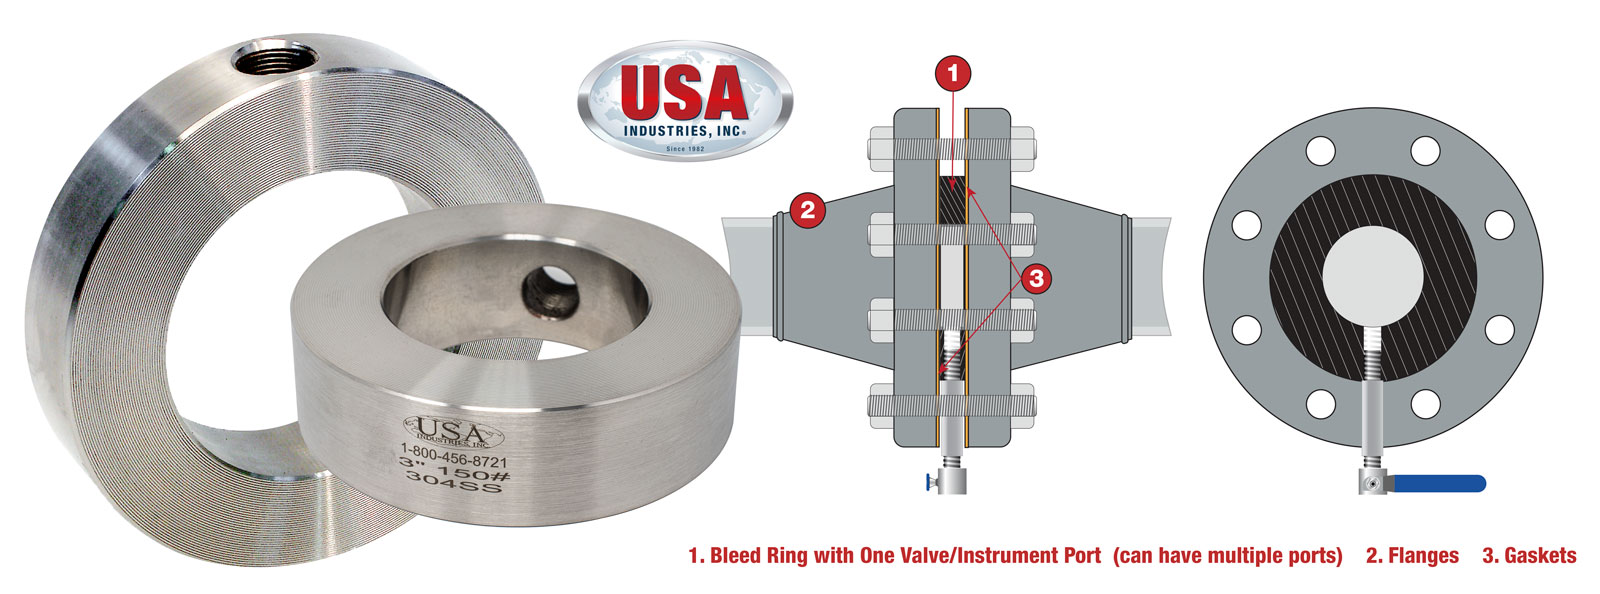 USA-Industries-Bleed-Rings-Illustration-Added-v1